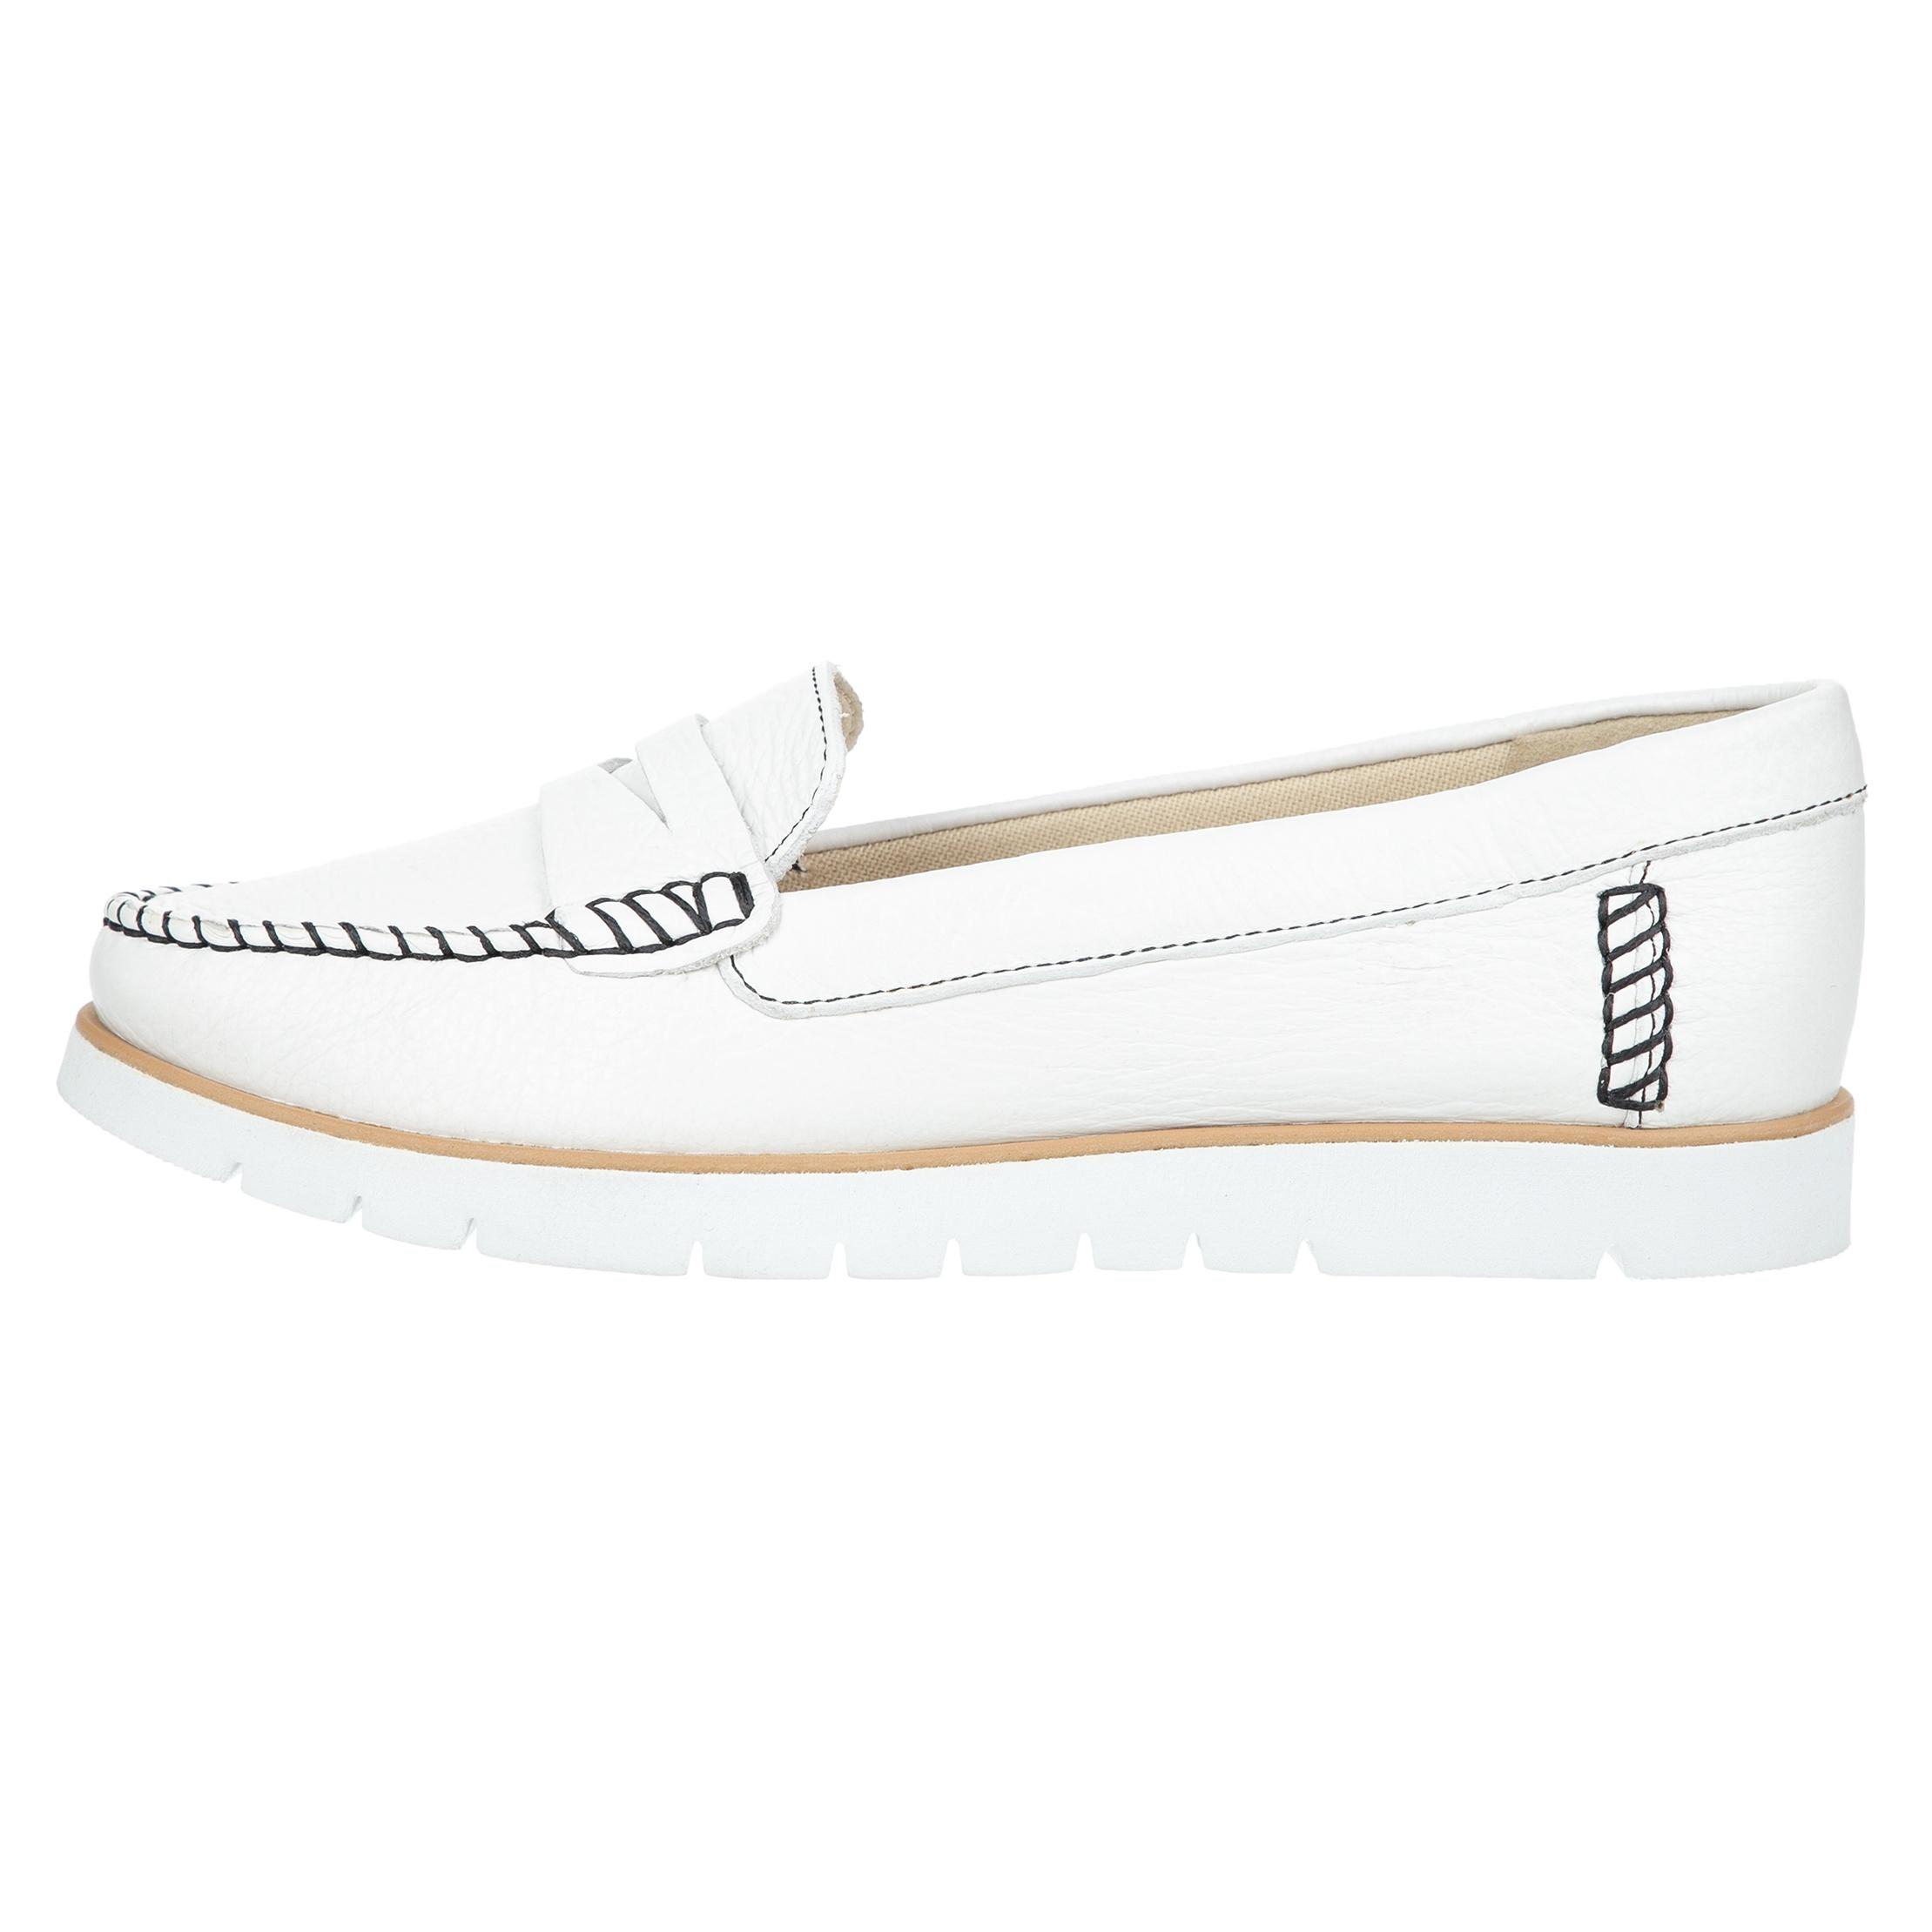 کفش زنانه جی اوکس مدل D724PF-000AK-C1000